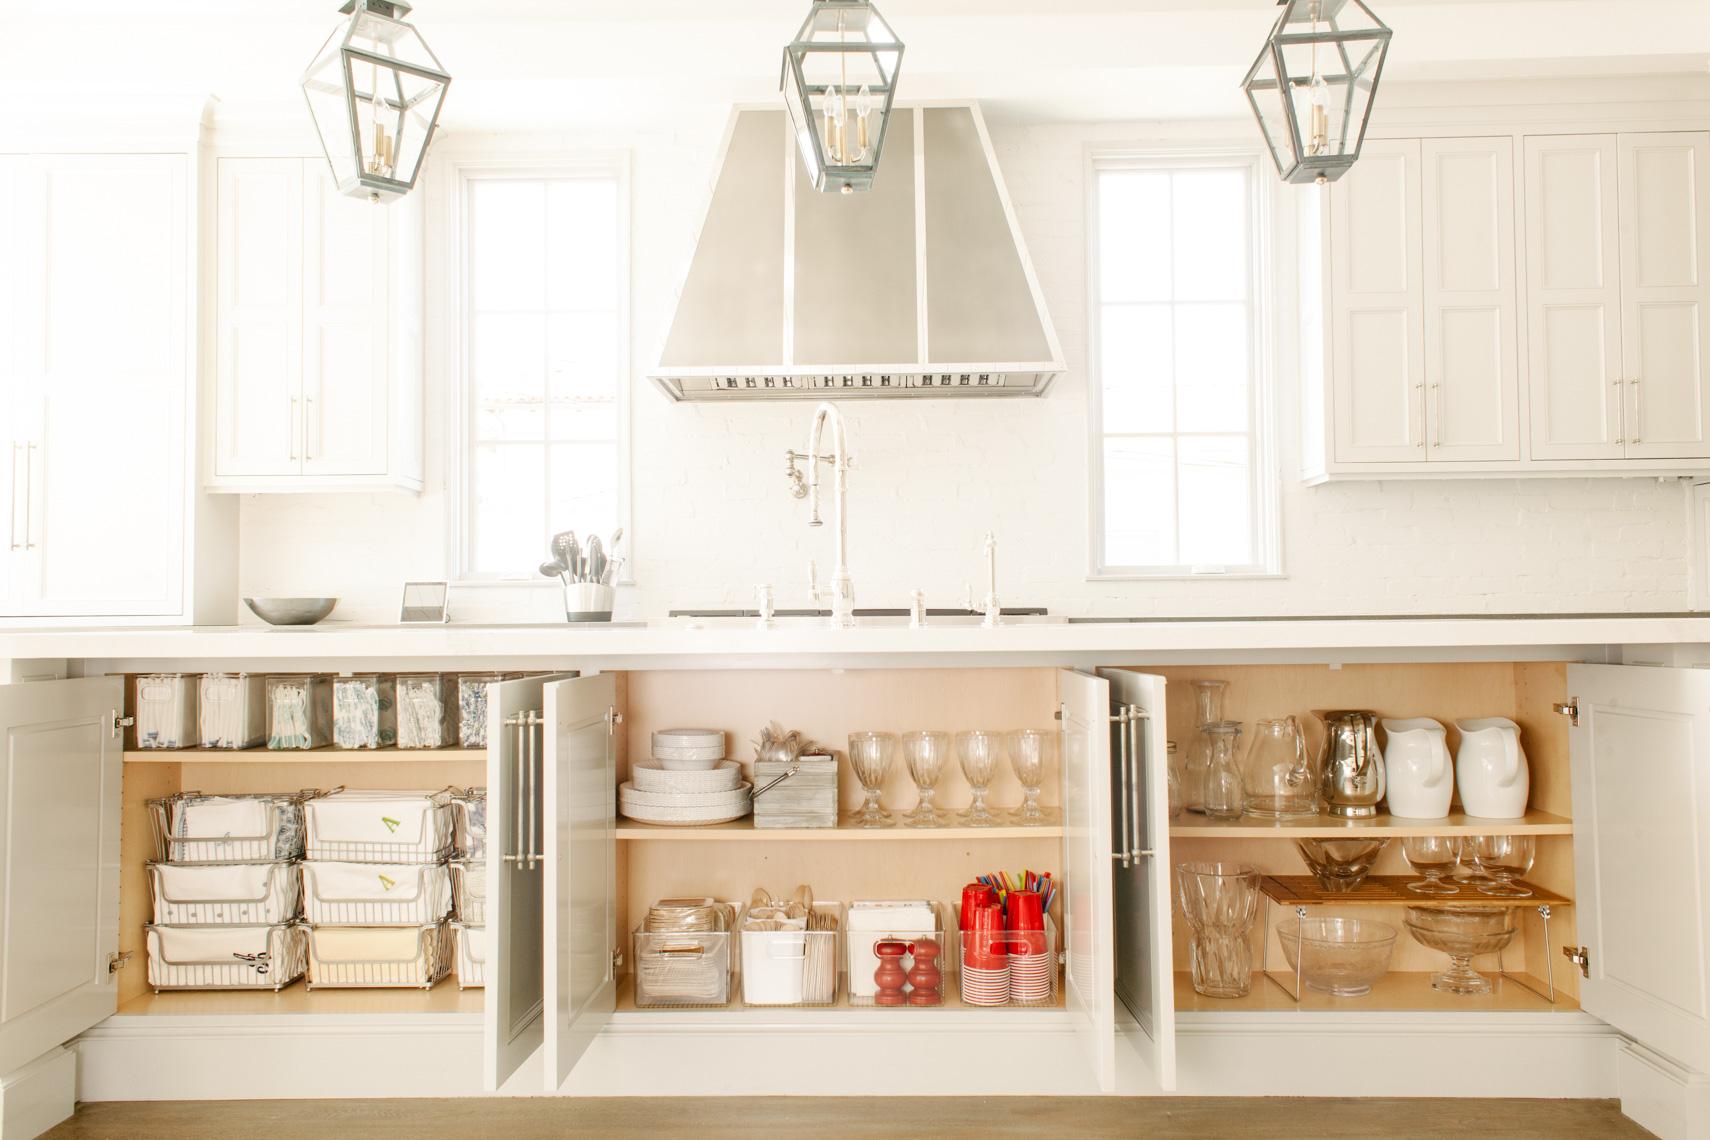 Kitchen-organizing-life-in-jeneral.jpg